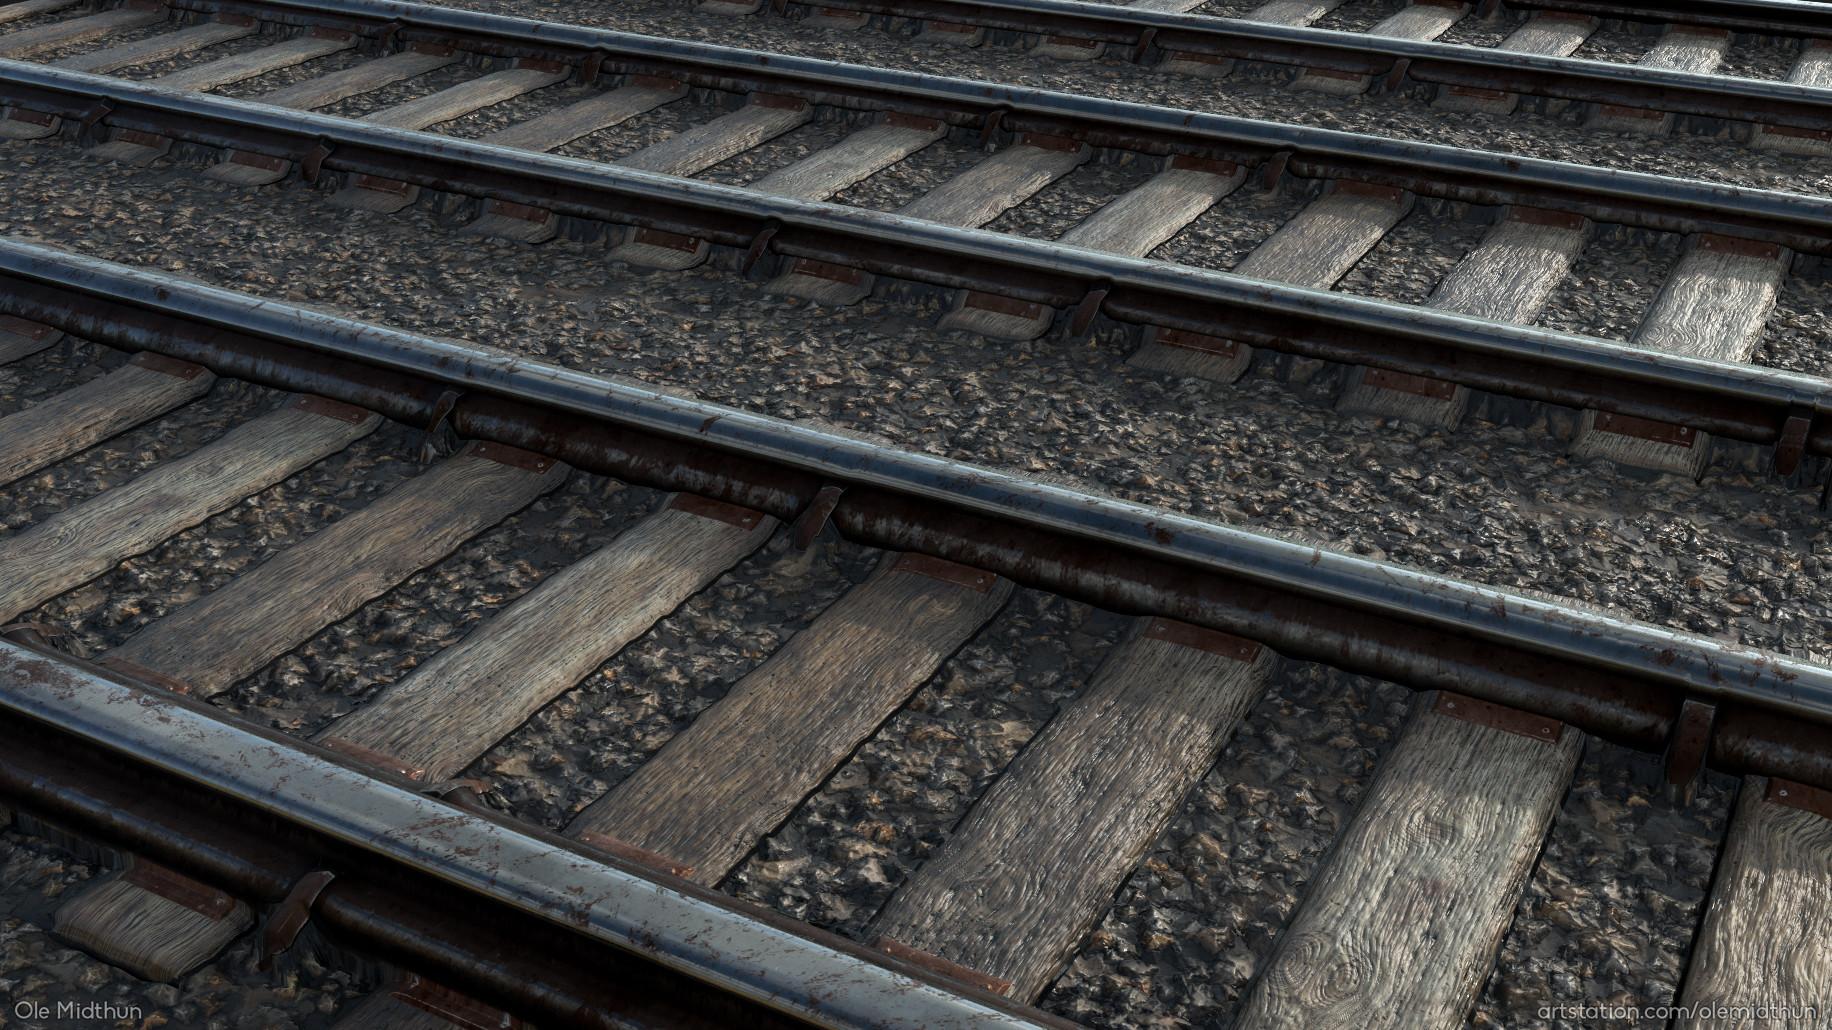 Ole midthun rails render 3